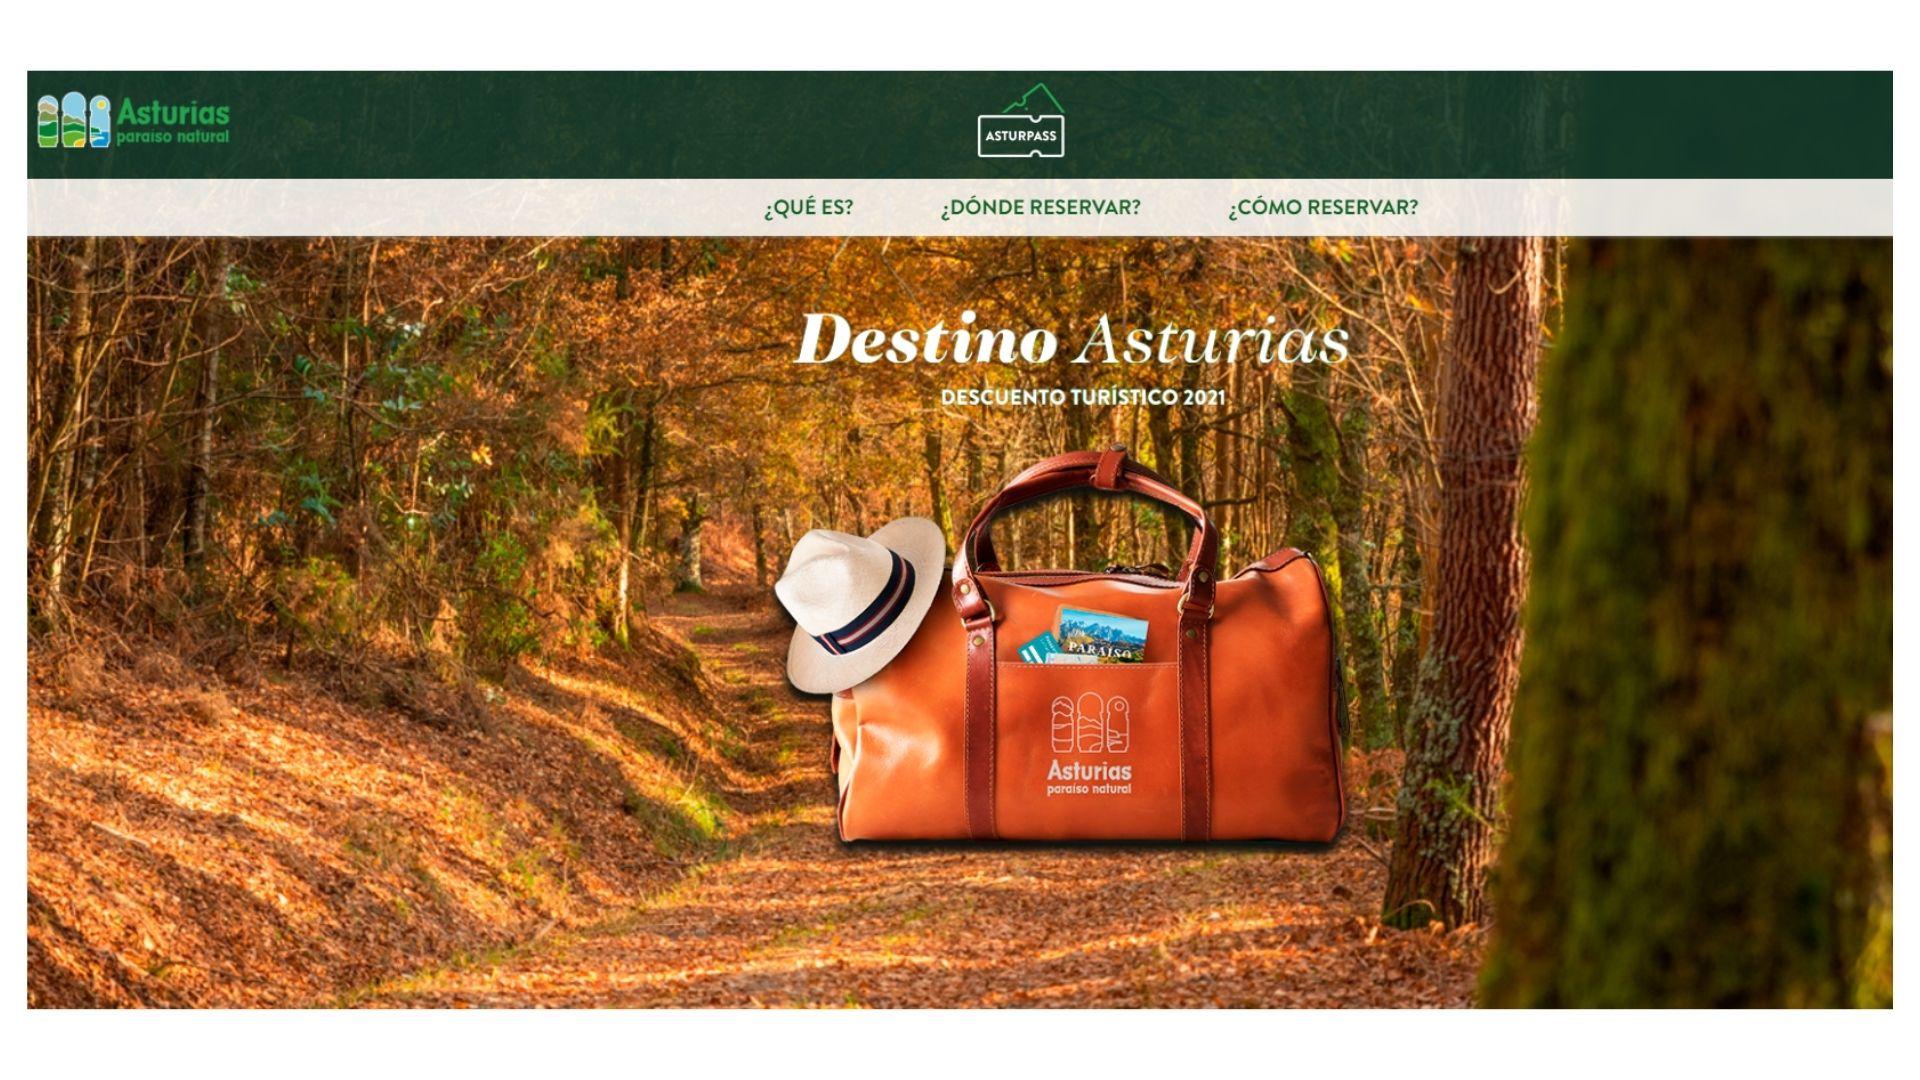 asturpass-descuento-turistico-para-residentes-en-asturias-1920